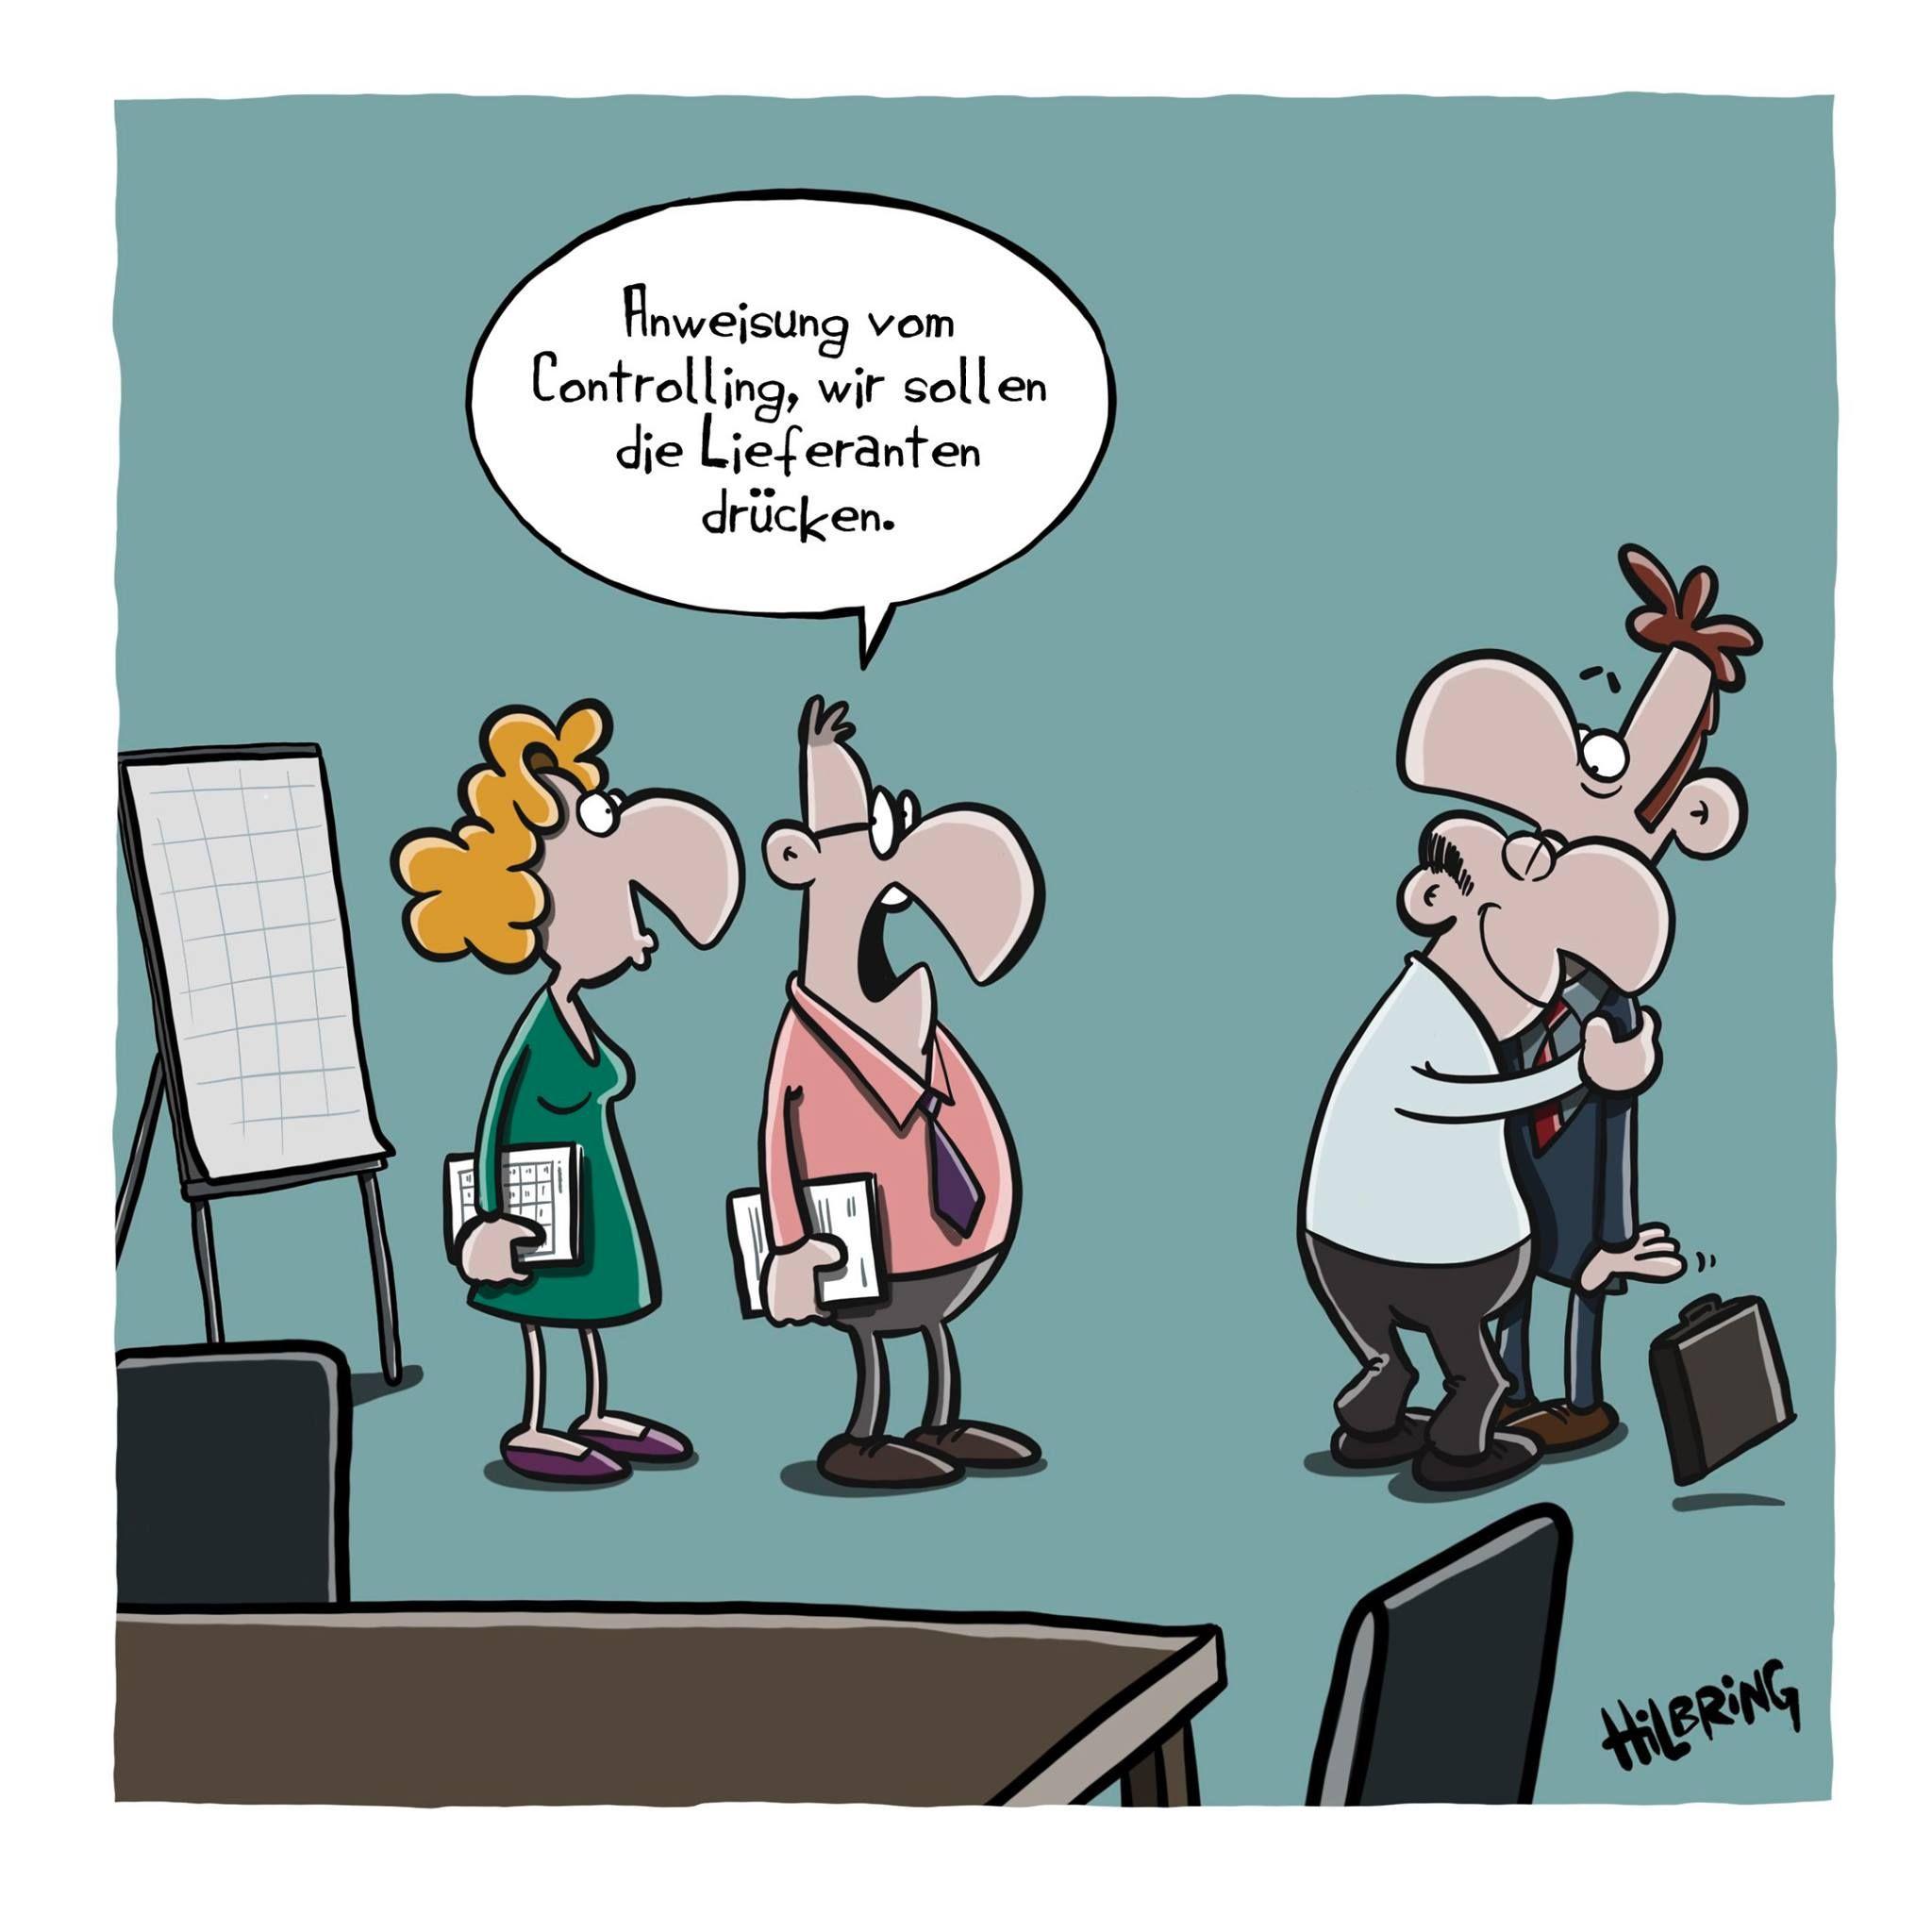 Pin by Knoblich on Cartoon Hilbring | Pinterest | Cartoon